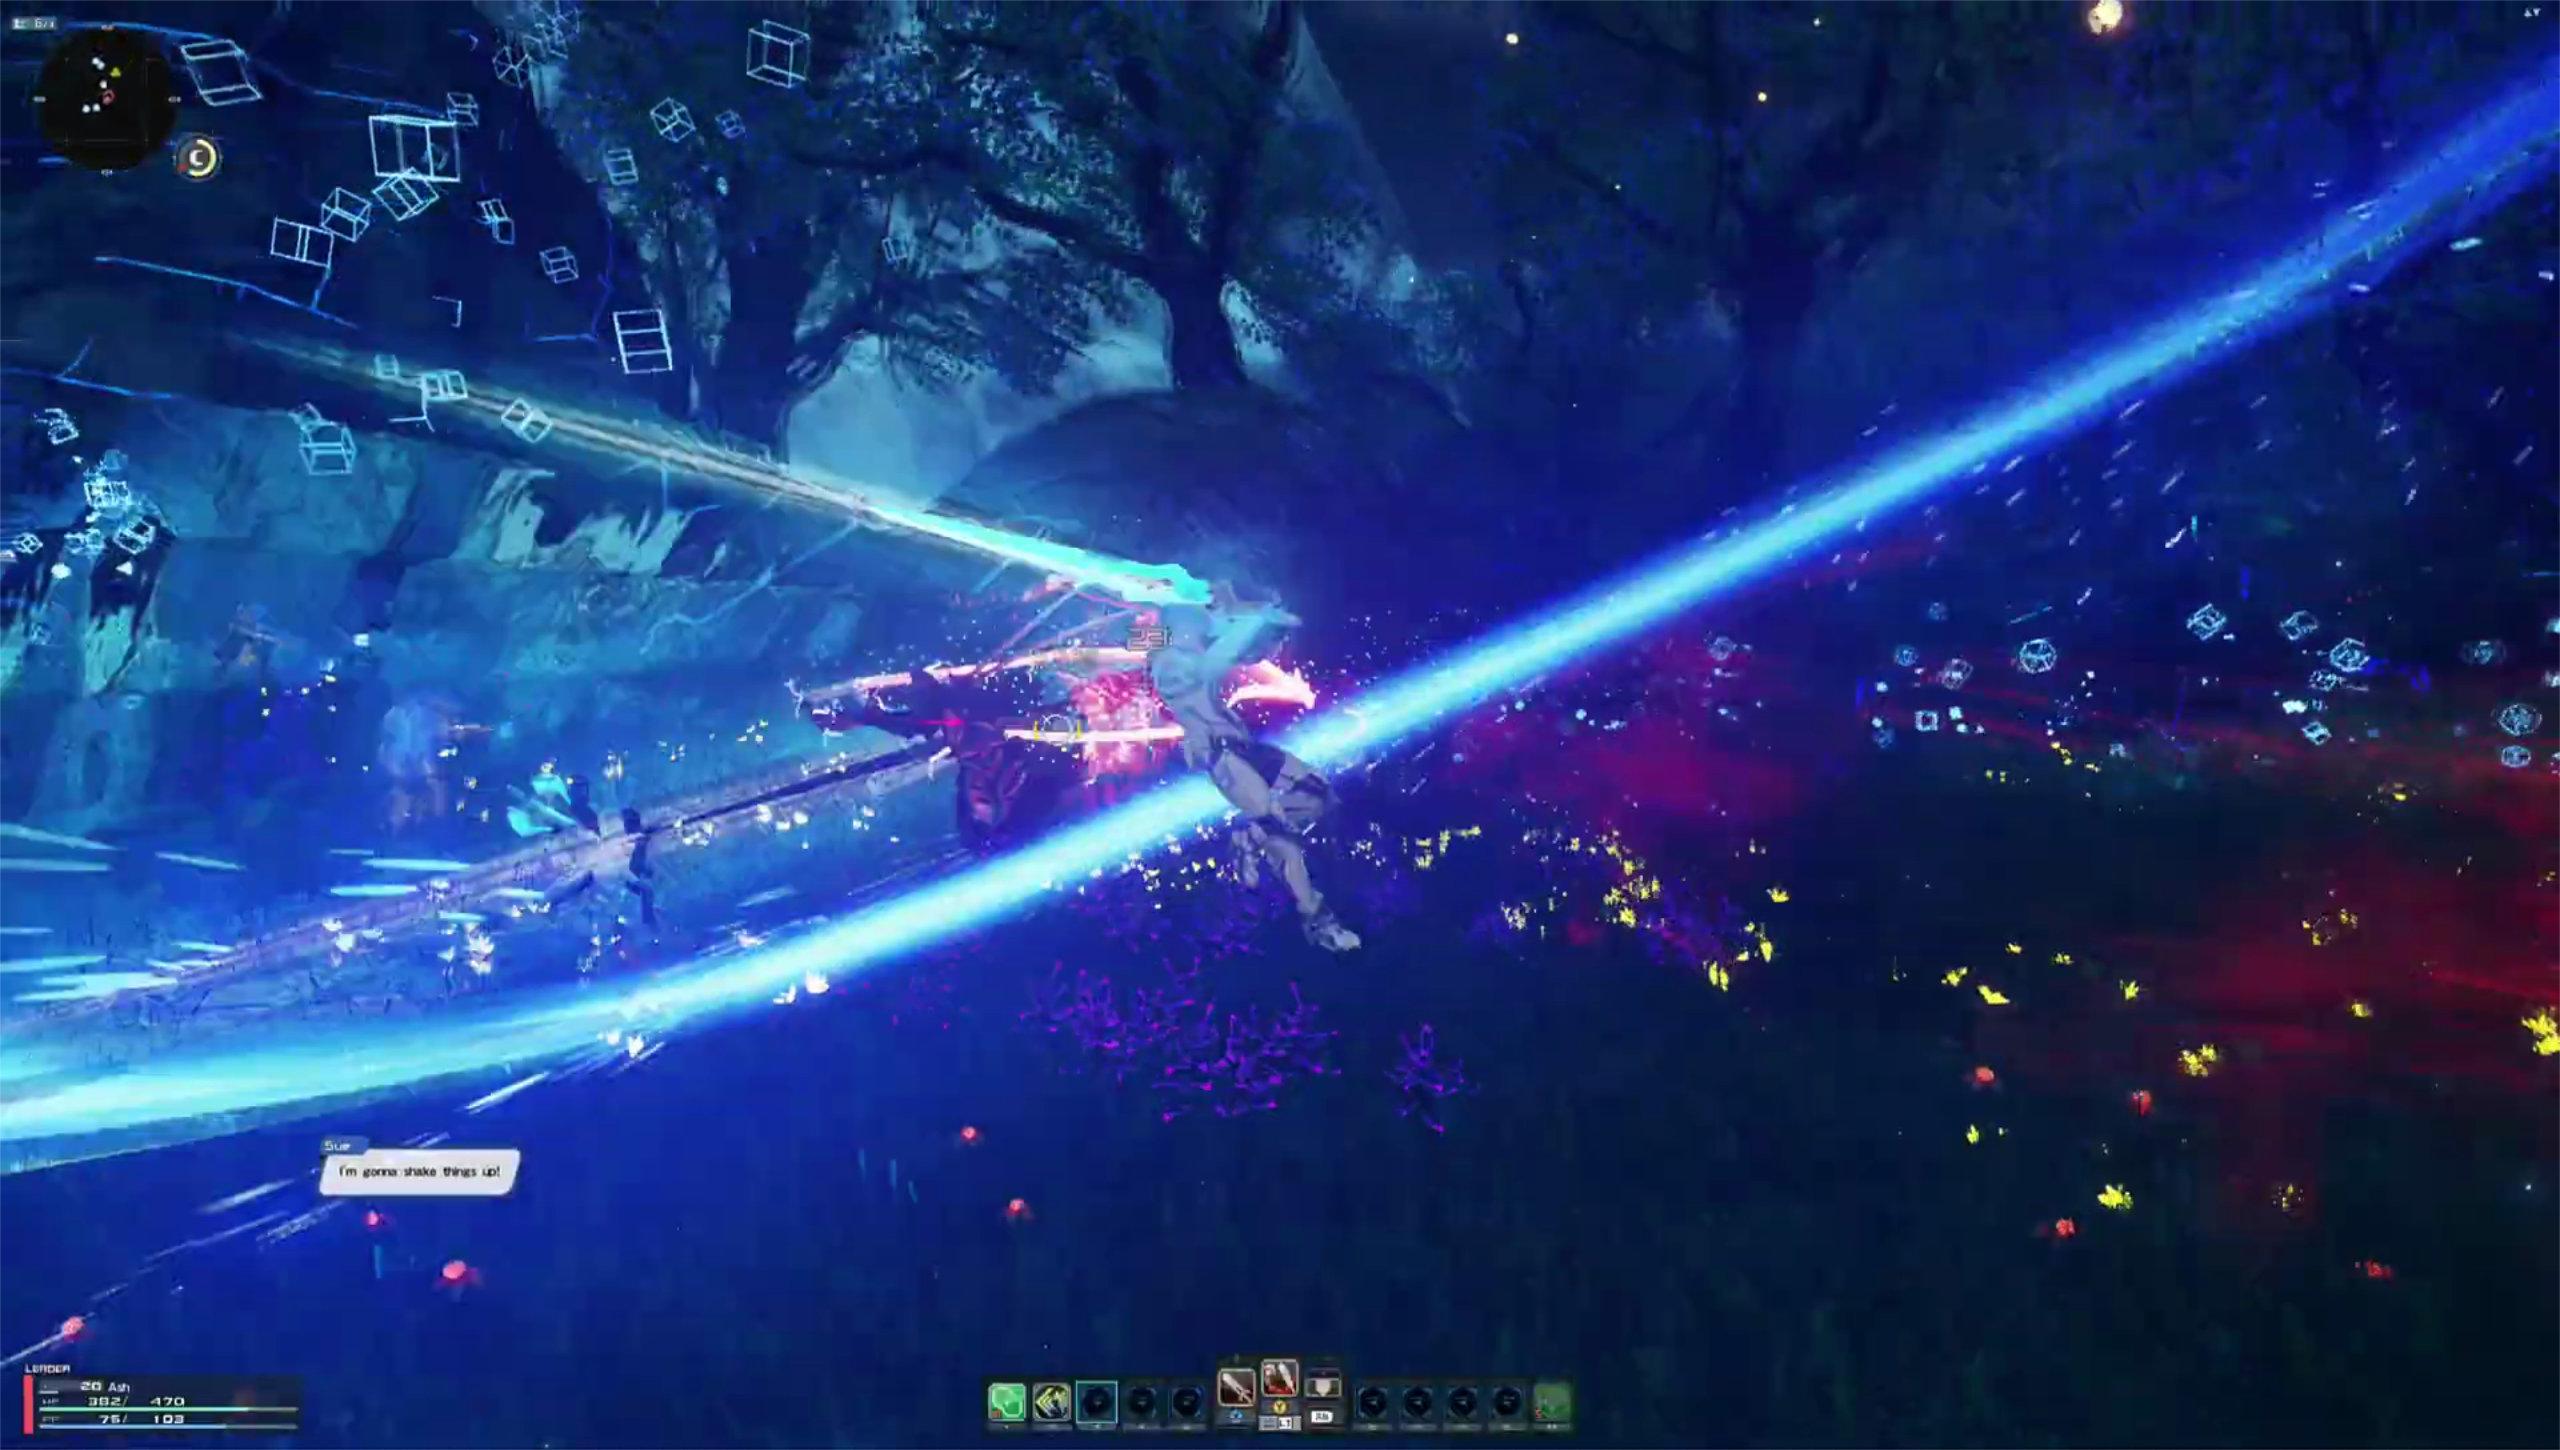 Phantasy-Star-Online-2-New-Genesis-Screenshot-016.jpg